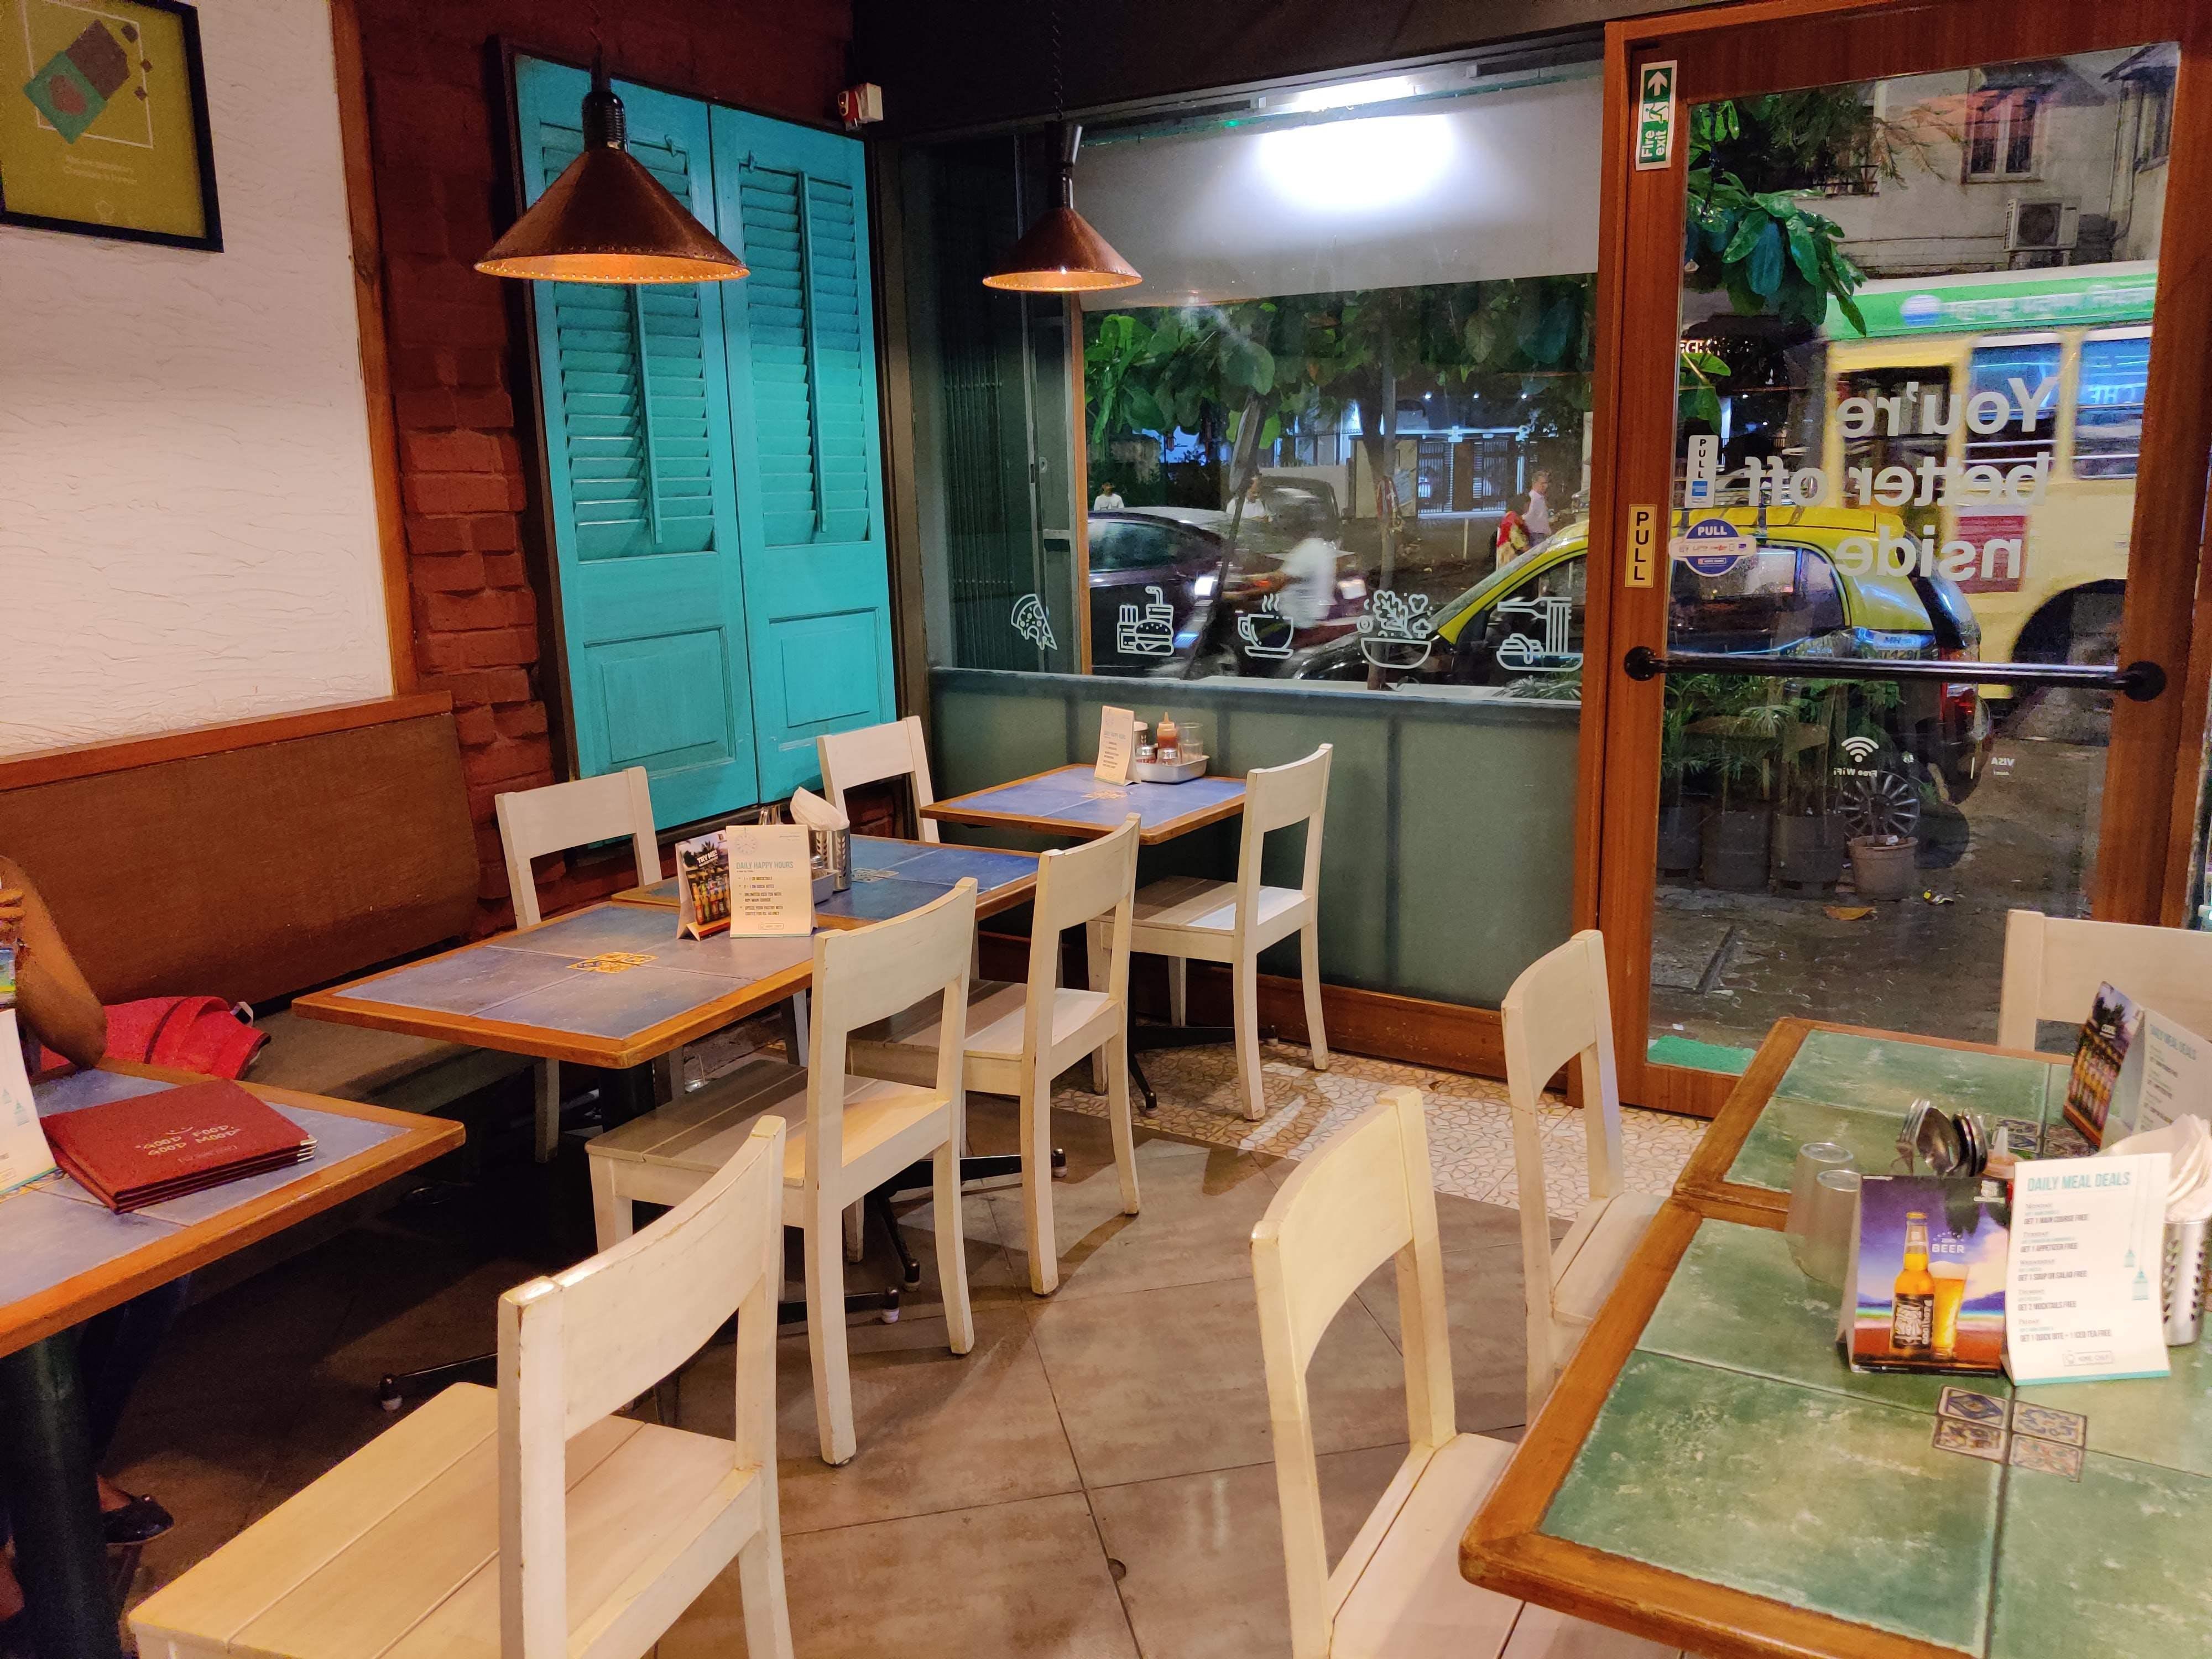 Room,Restaurant,Building,Table,Interior design,Furniture,Café,House,Business,Dining room